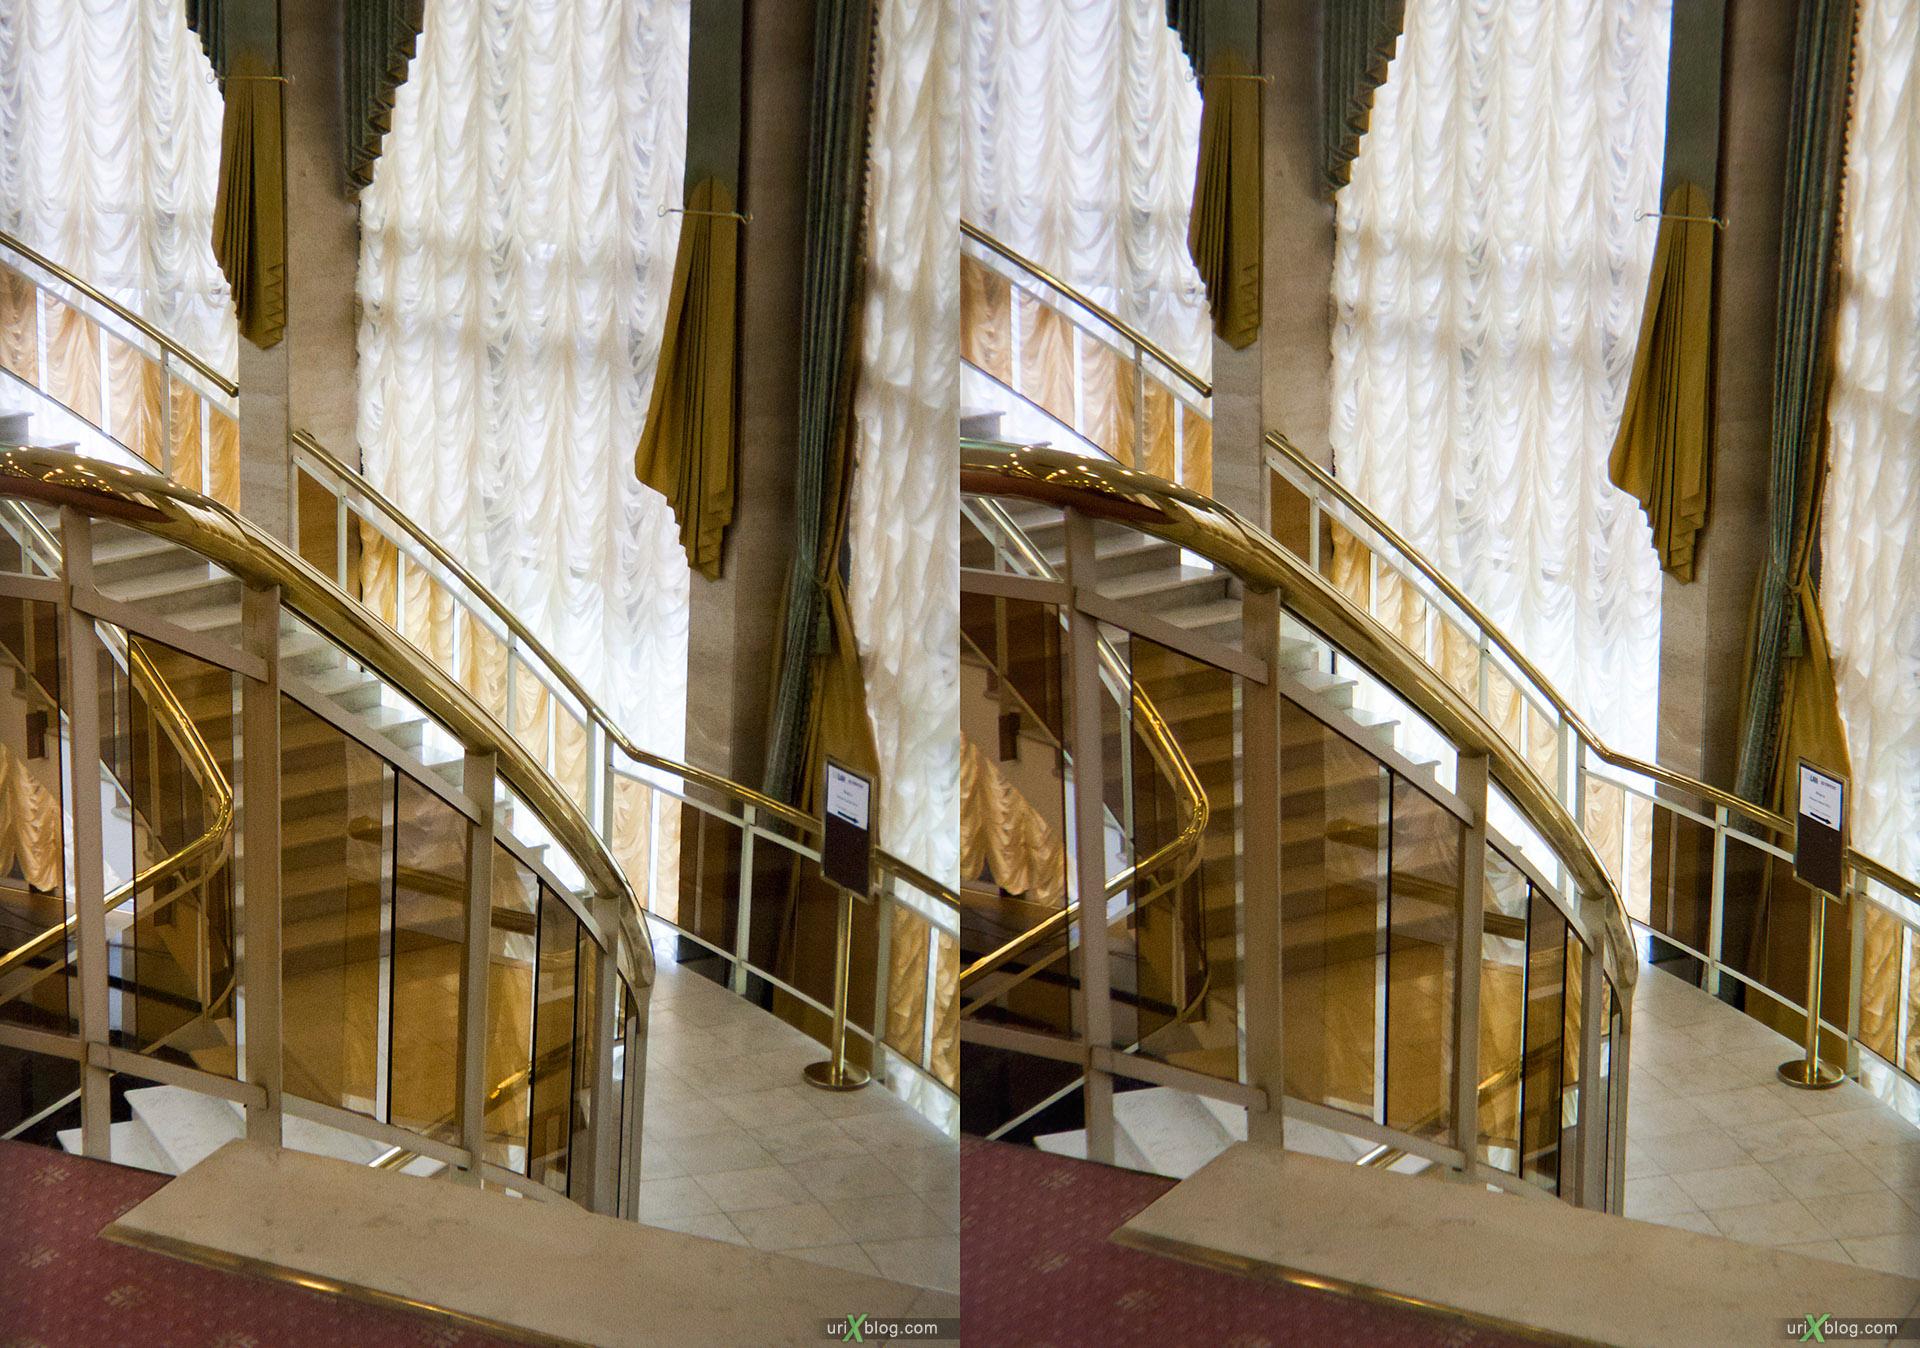 Loreo 3D lens in a cap стерео, стереопара Moscow, Radisson Slavyanskaya Hotel, Москва, Рэдиссон-Славянская, stereo, стерео, cross-eyed, 3D